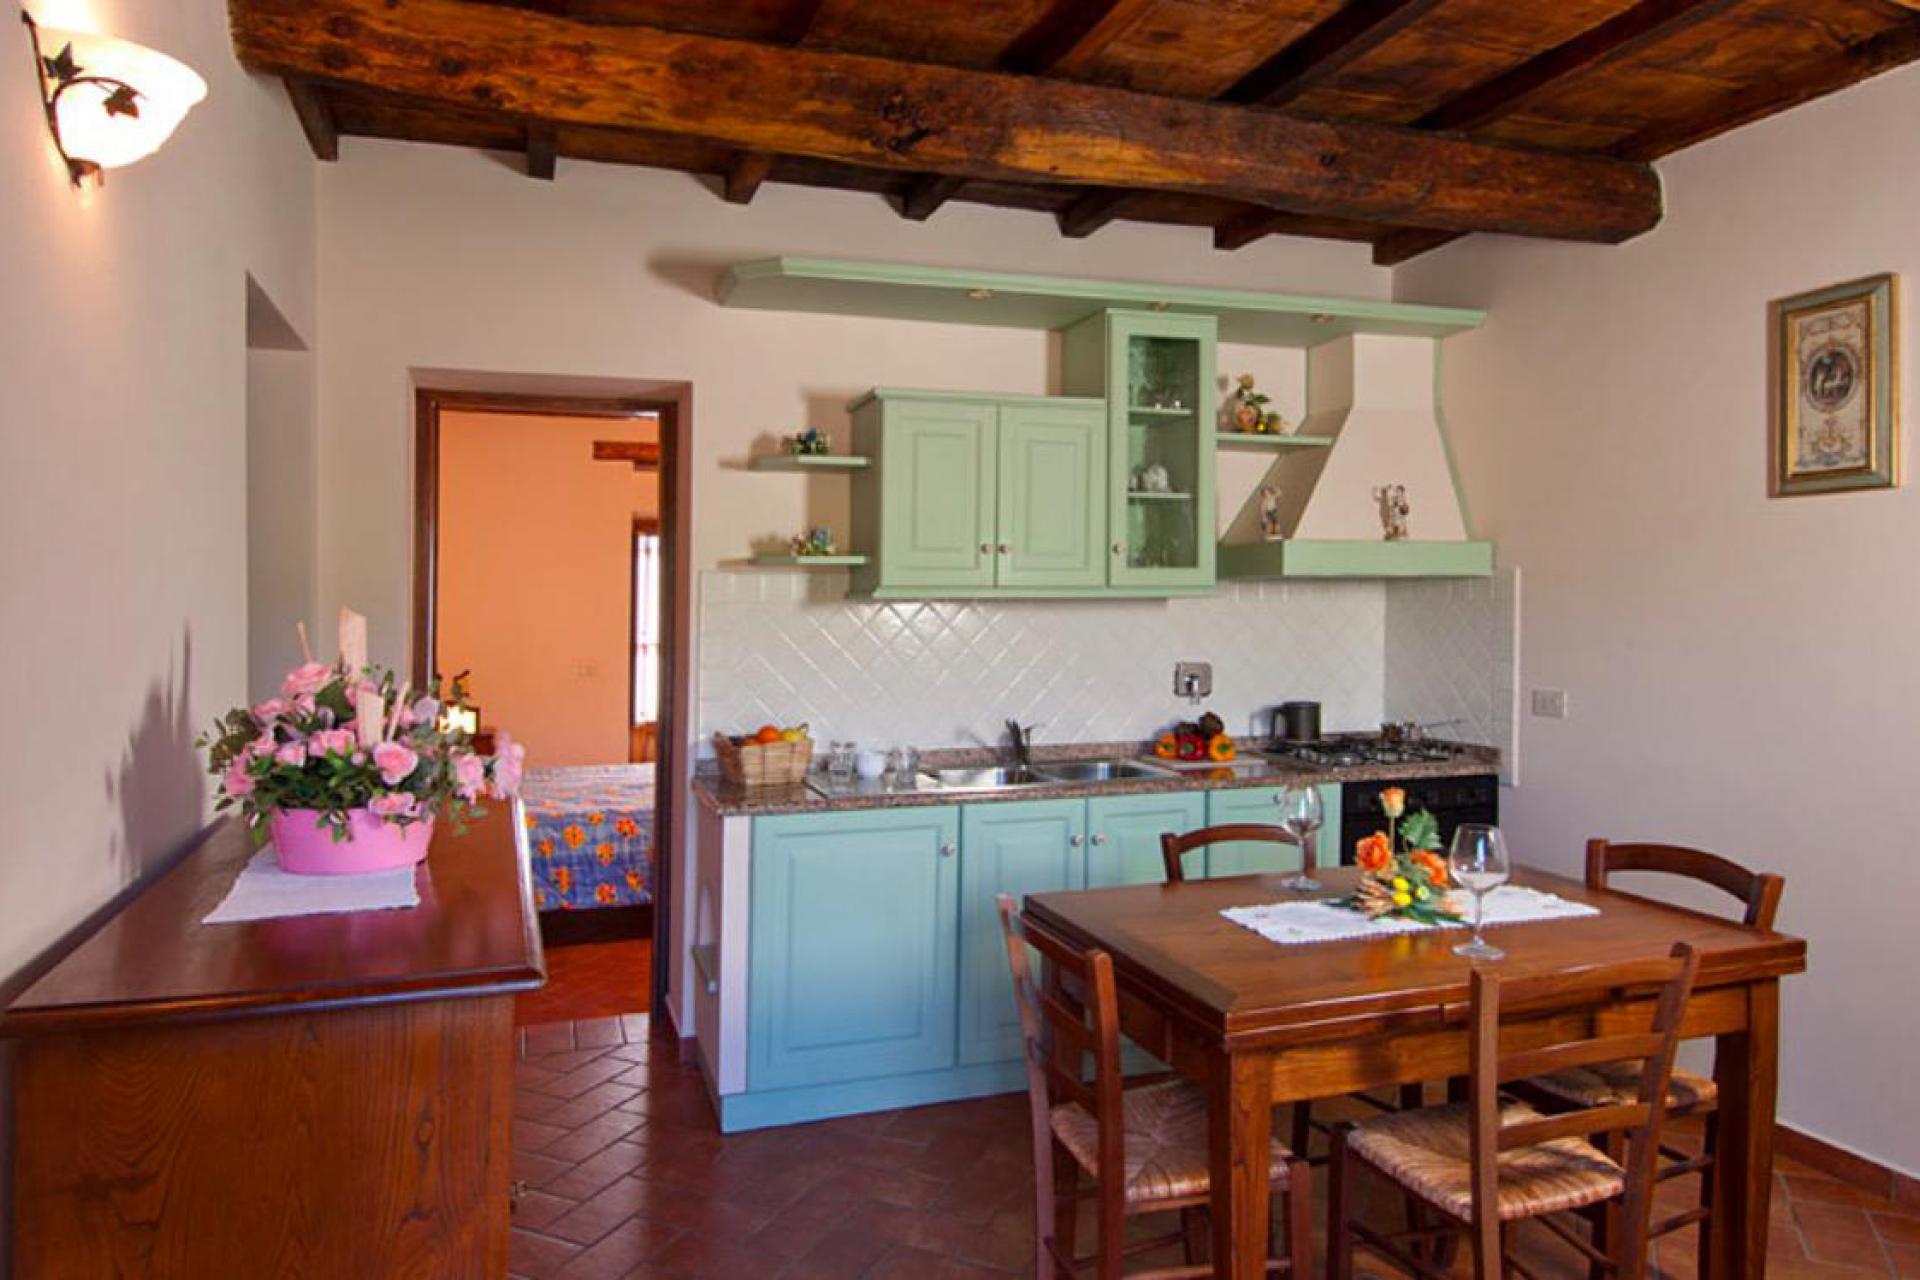 Agriturismo Toscane Agriturismo Toscane – huisjes en appartementen | myitaly.nl